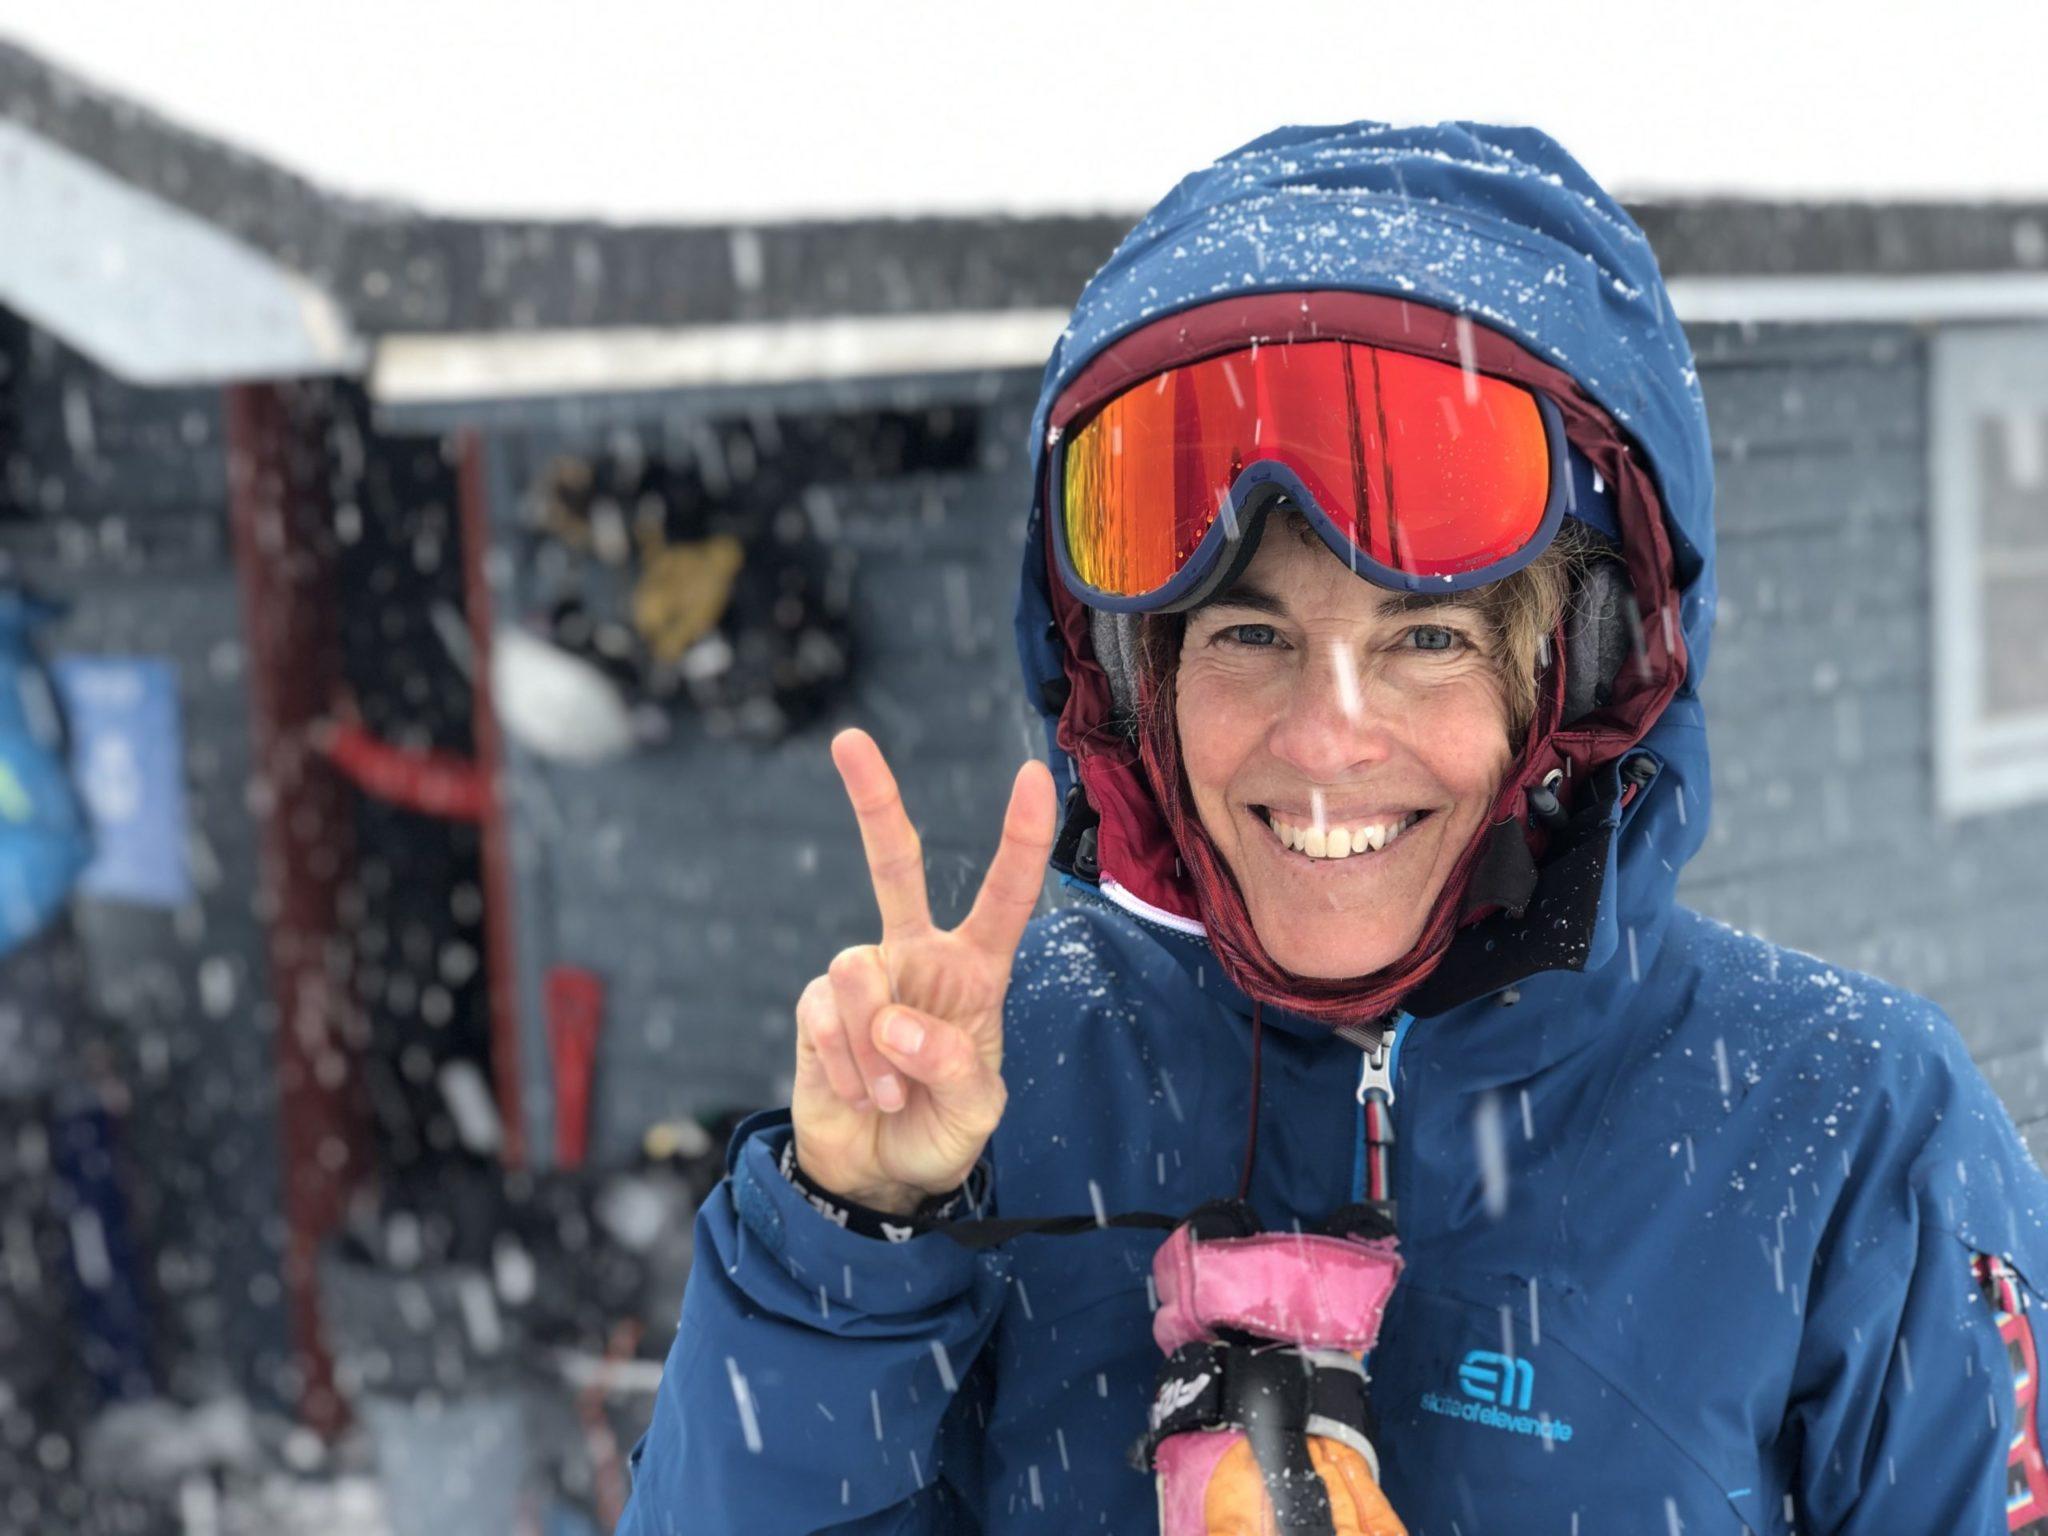 Michele Cardamone